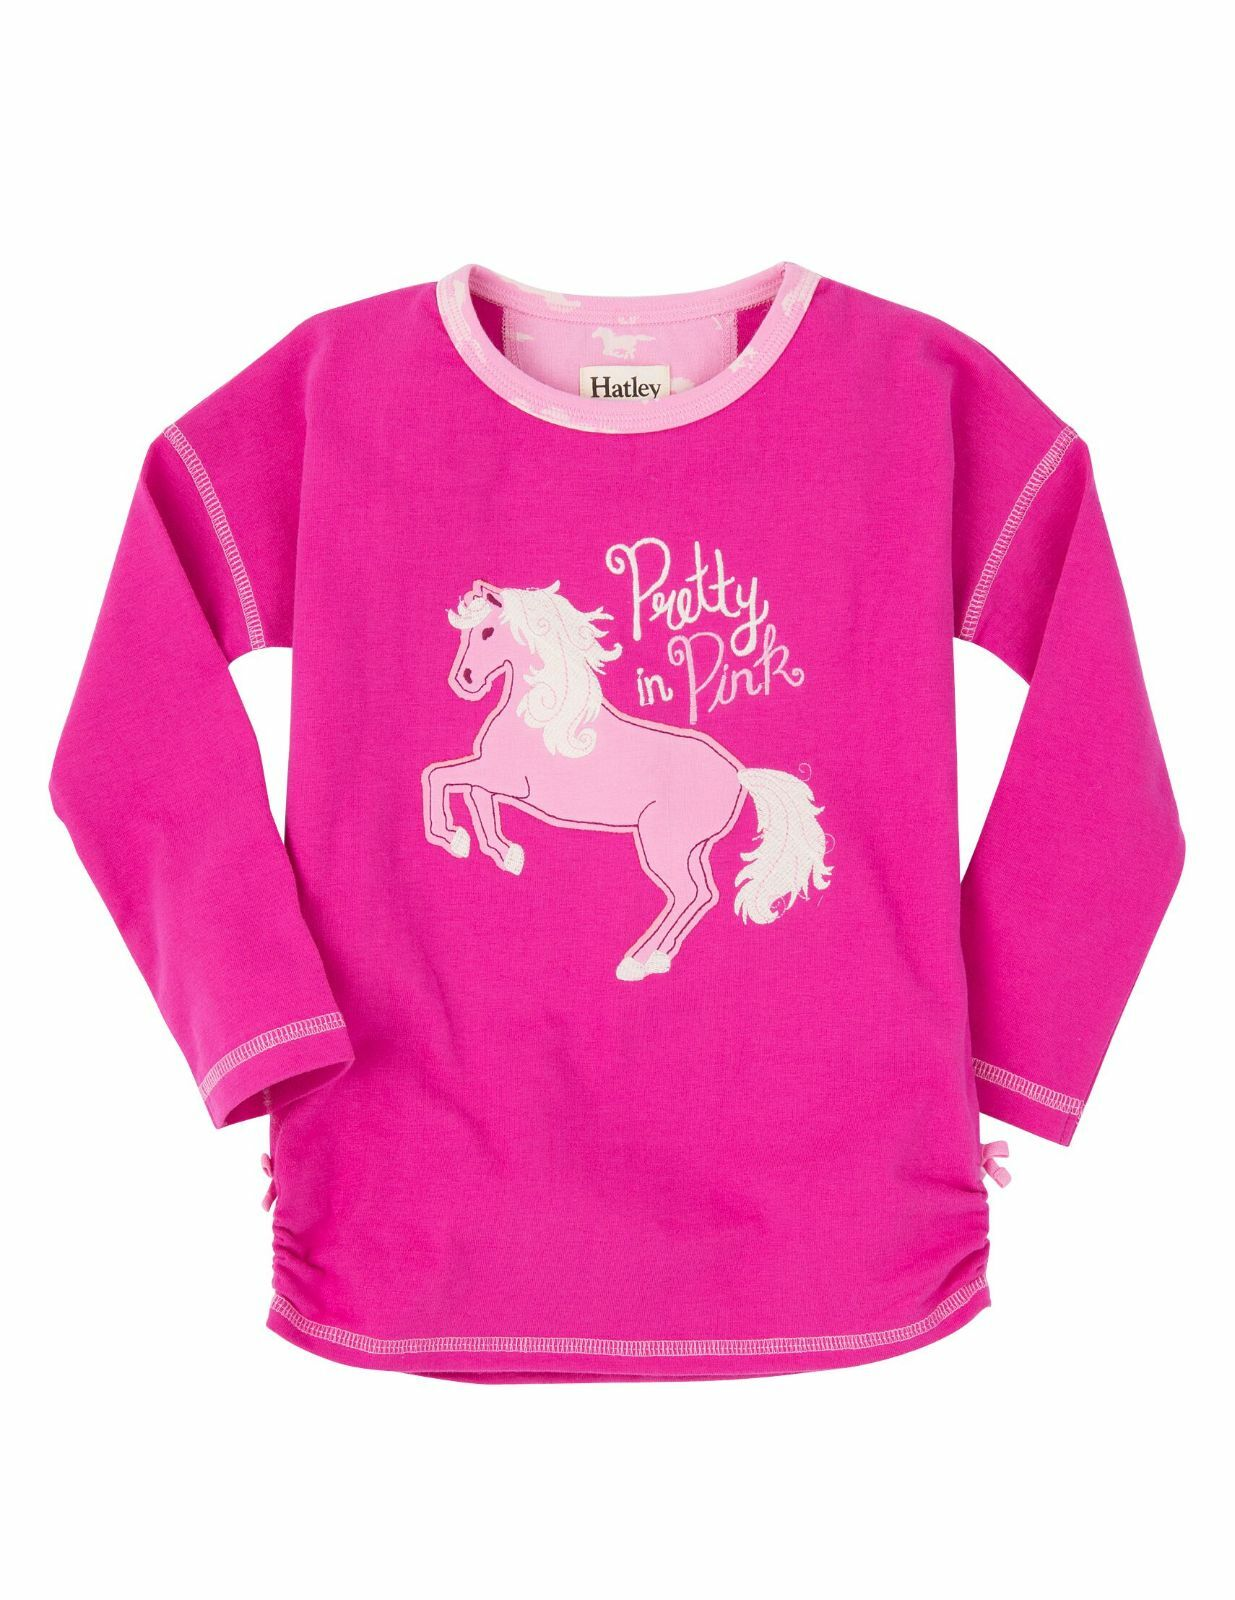 *BNWT* Hatley Girls Fairy Tale Horses Long Sleeved Top Pretty In Pink Pony